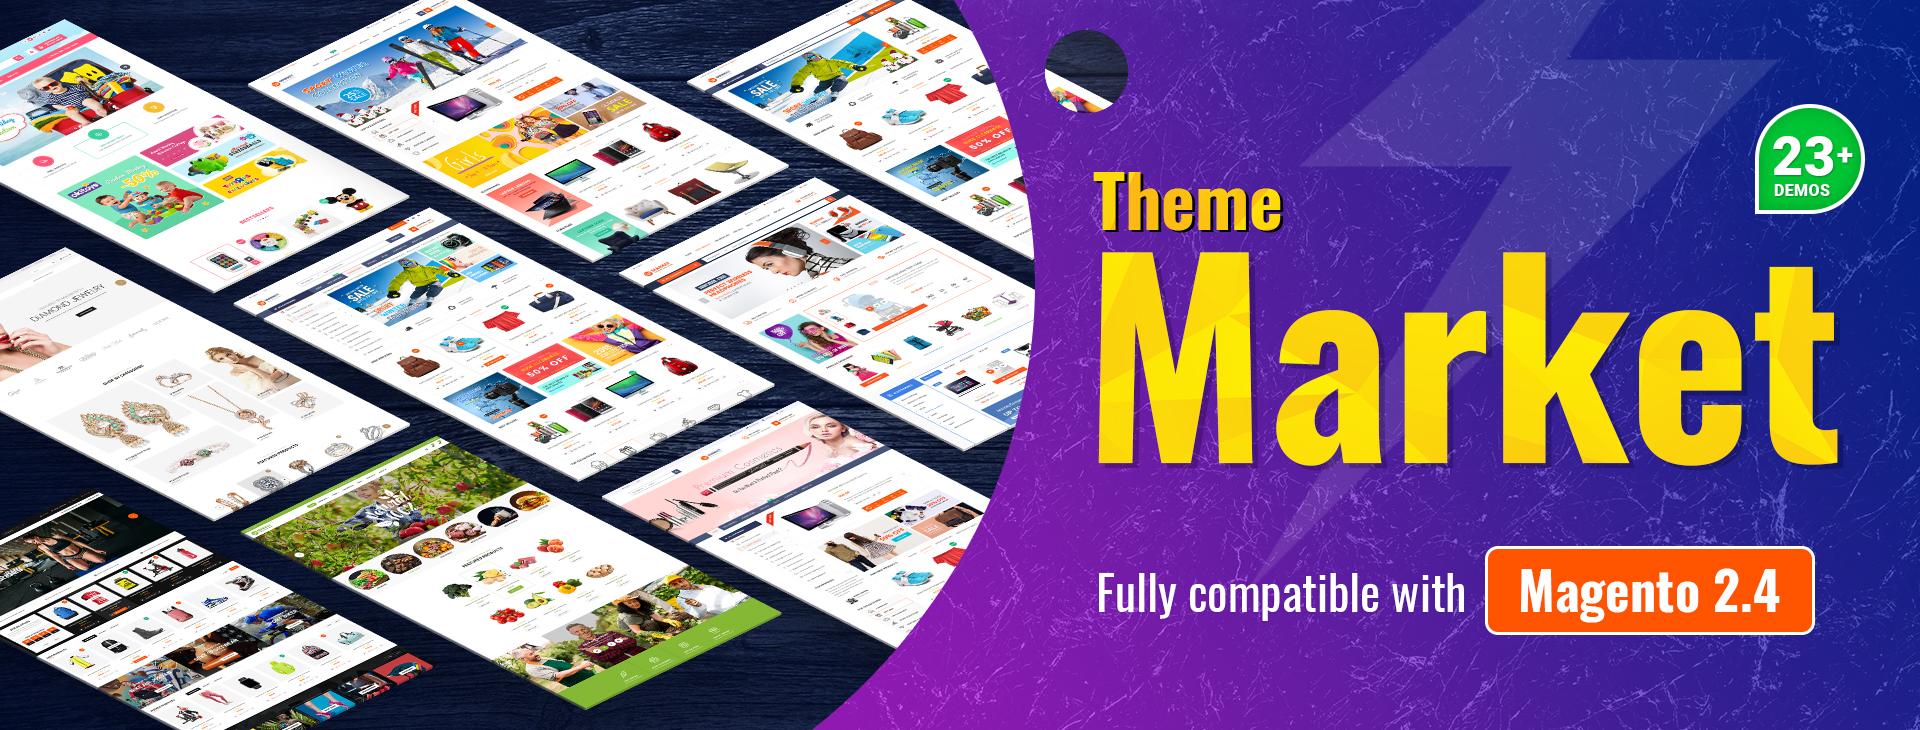 SM Market - The best Magento 2 theme